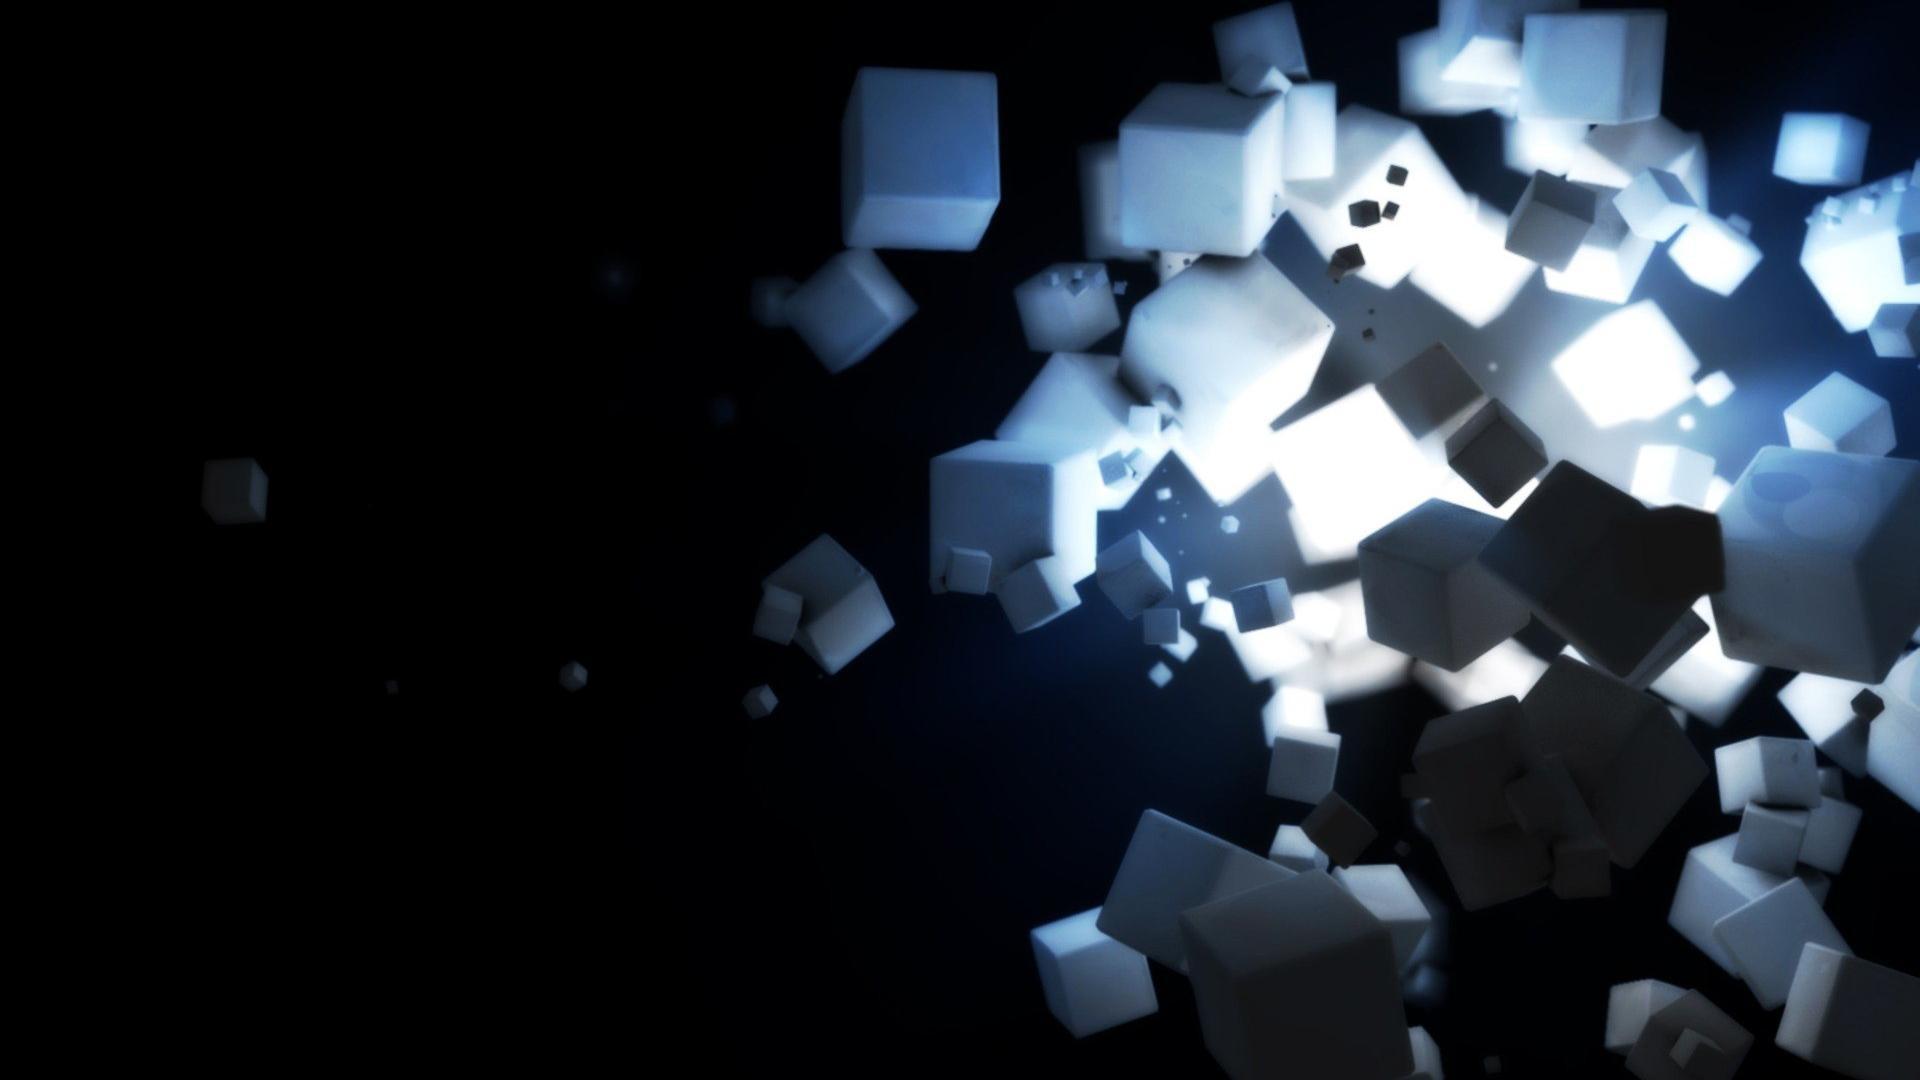 Hd Black and White Wallpapers: Light Black Dark White Sugar Cubes Hd  Wallpaper Hq 1920x1080px